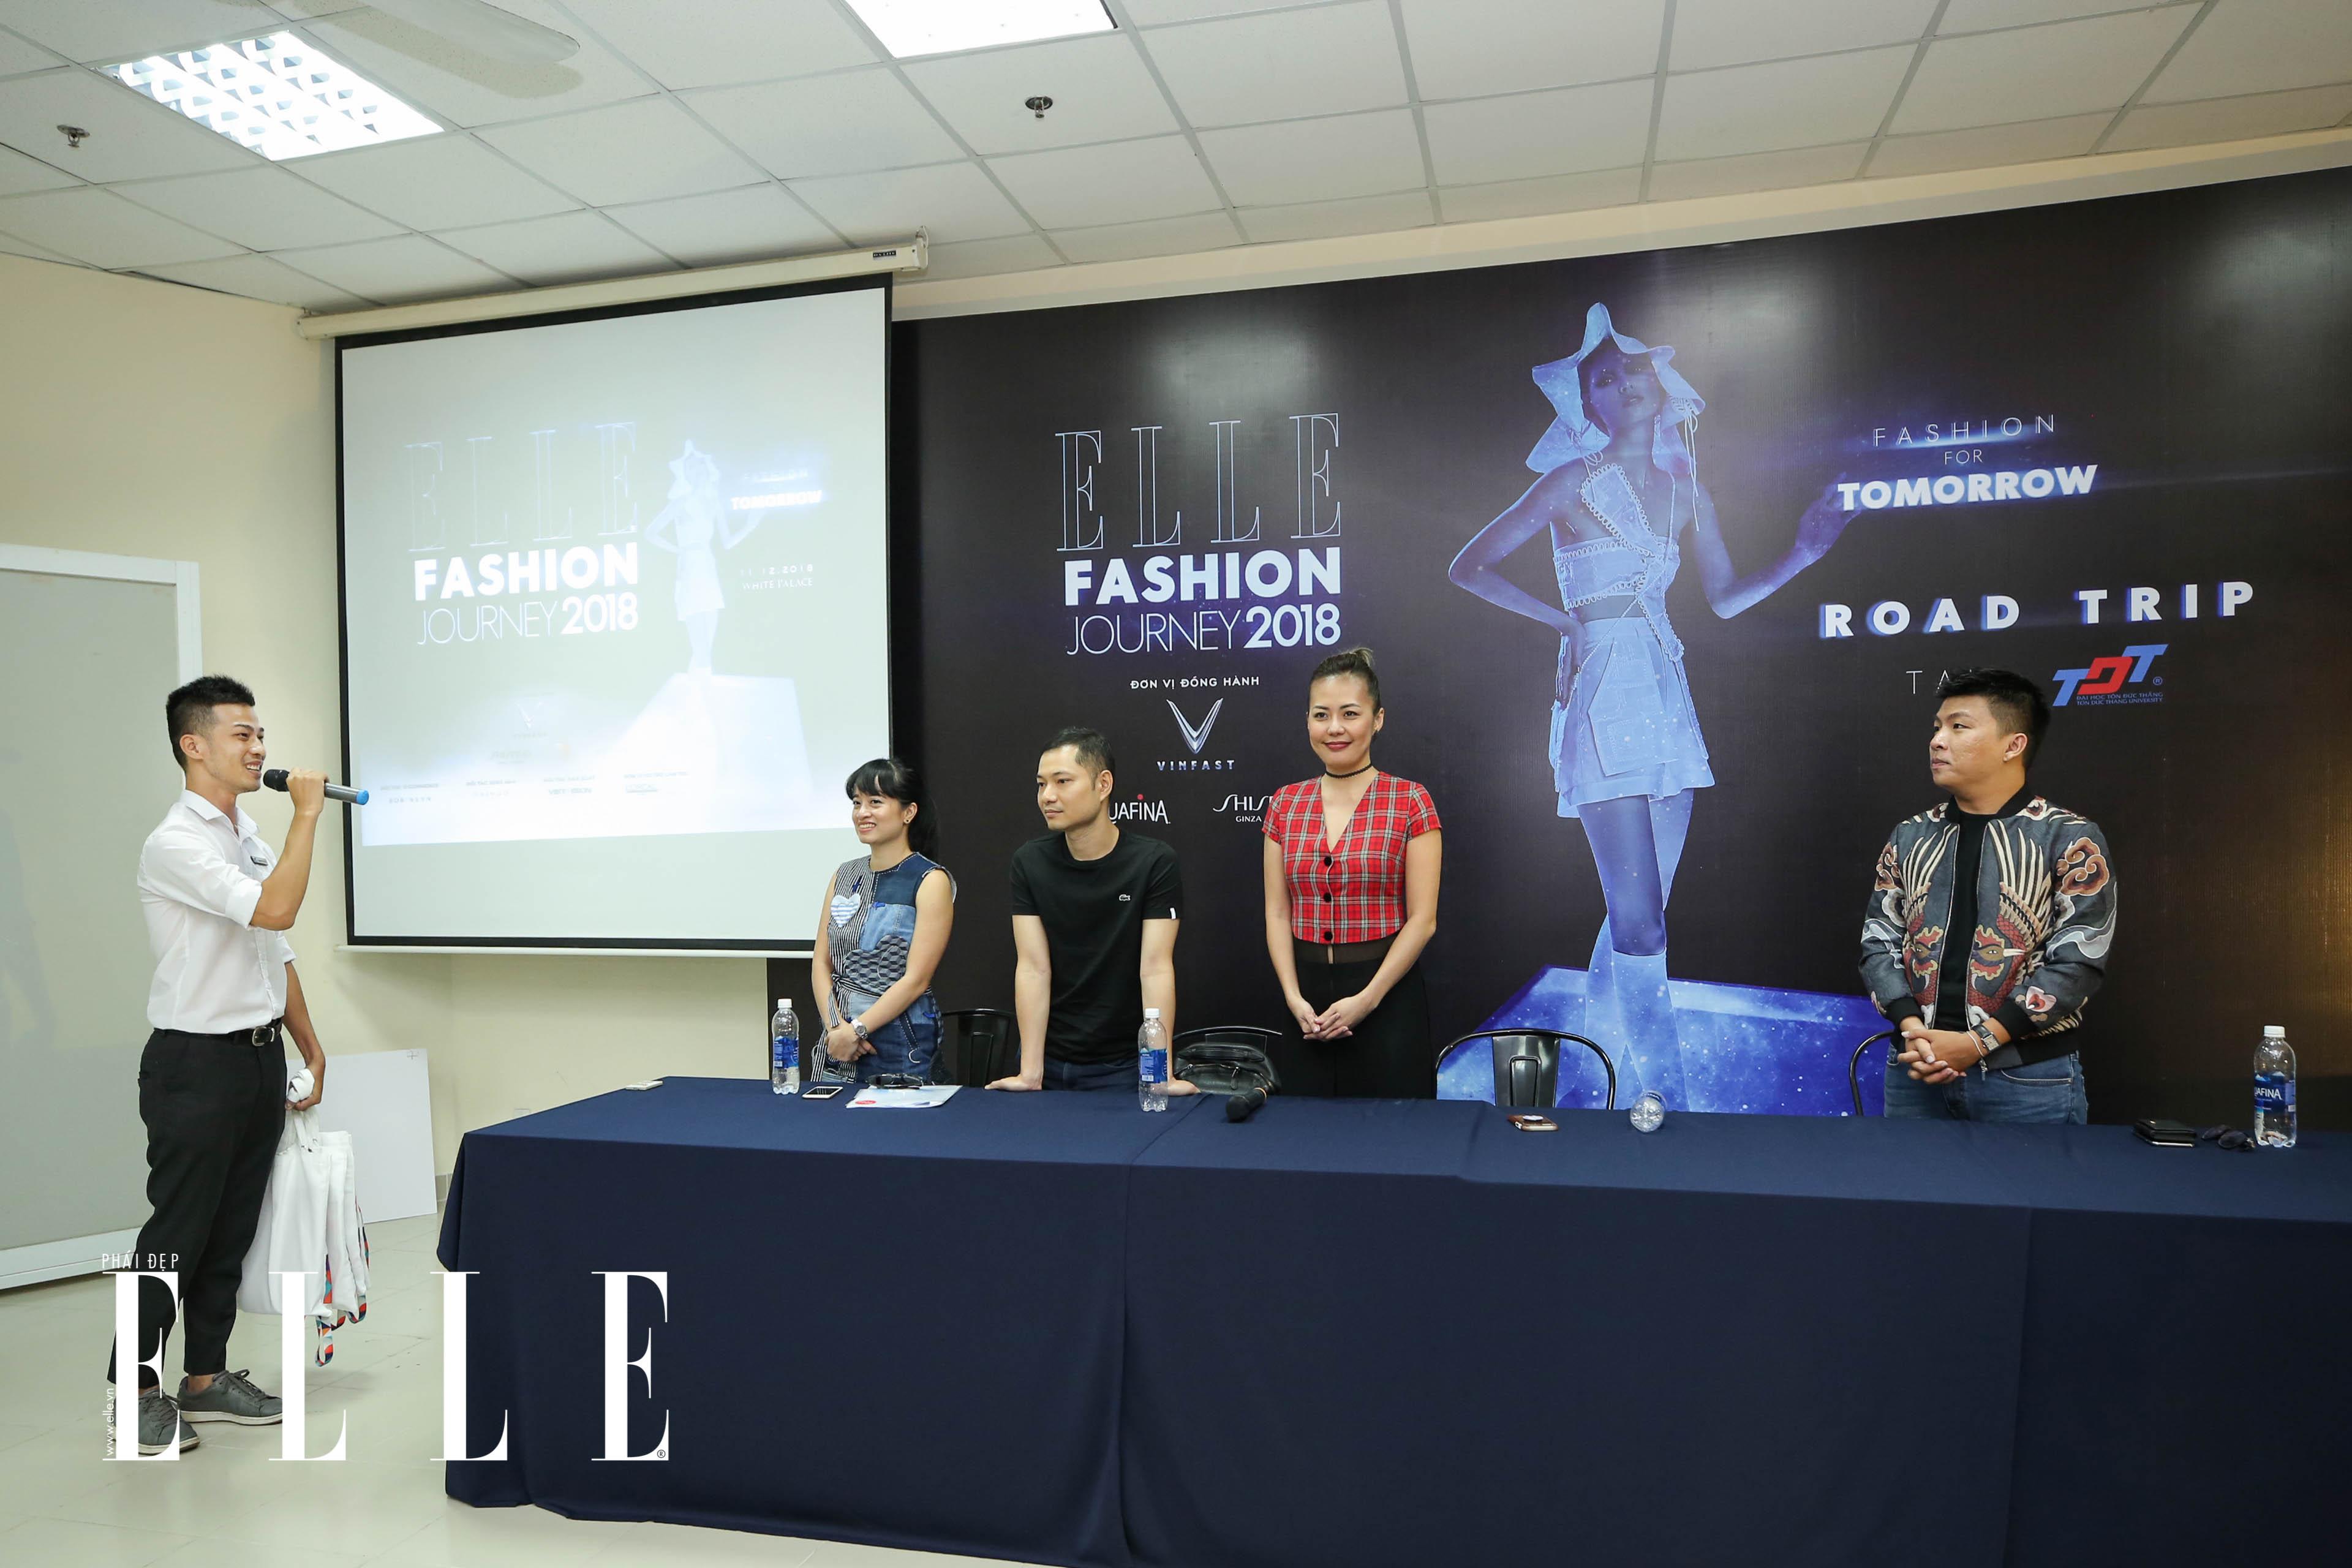 ELLE Fashion Journey 2018 12